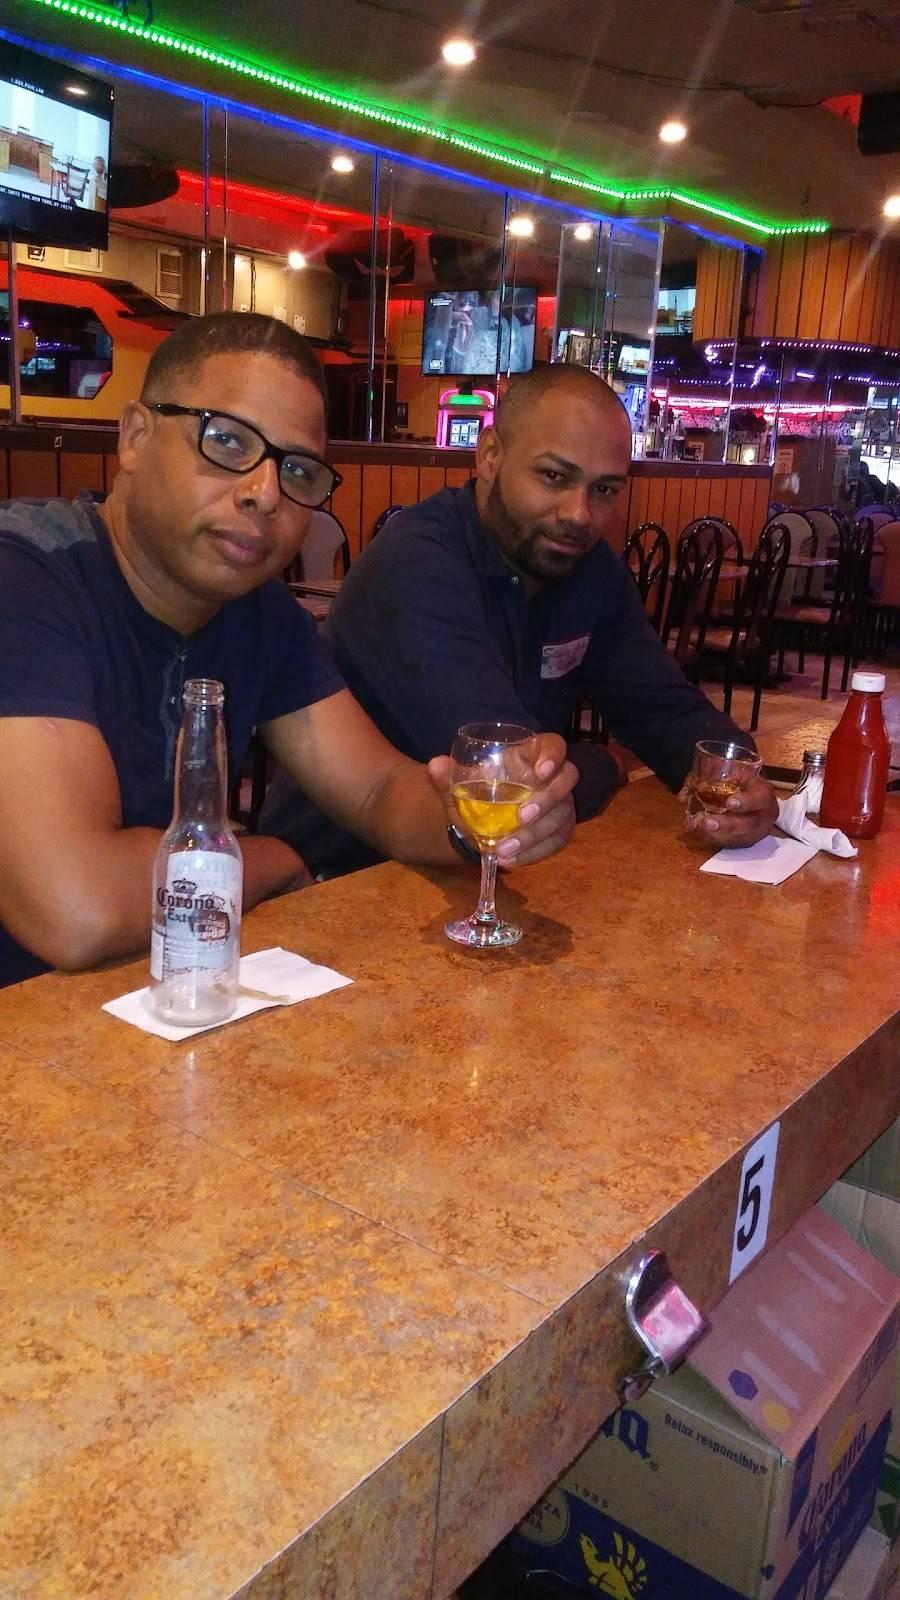 El Nuevo Puerto Plata | restaurant | 3123 Fulton St, Brooklyn, NY 11208, USA | 7182353564 OR +1 718-235-3564